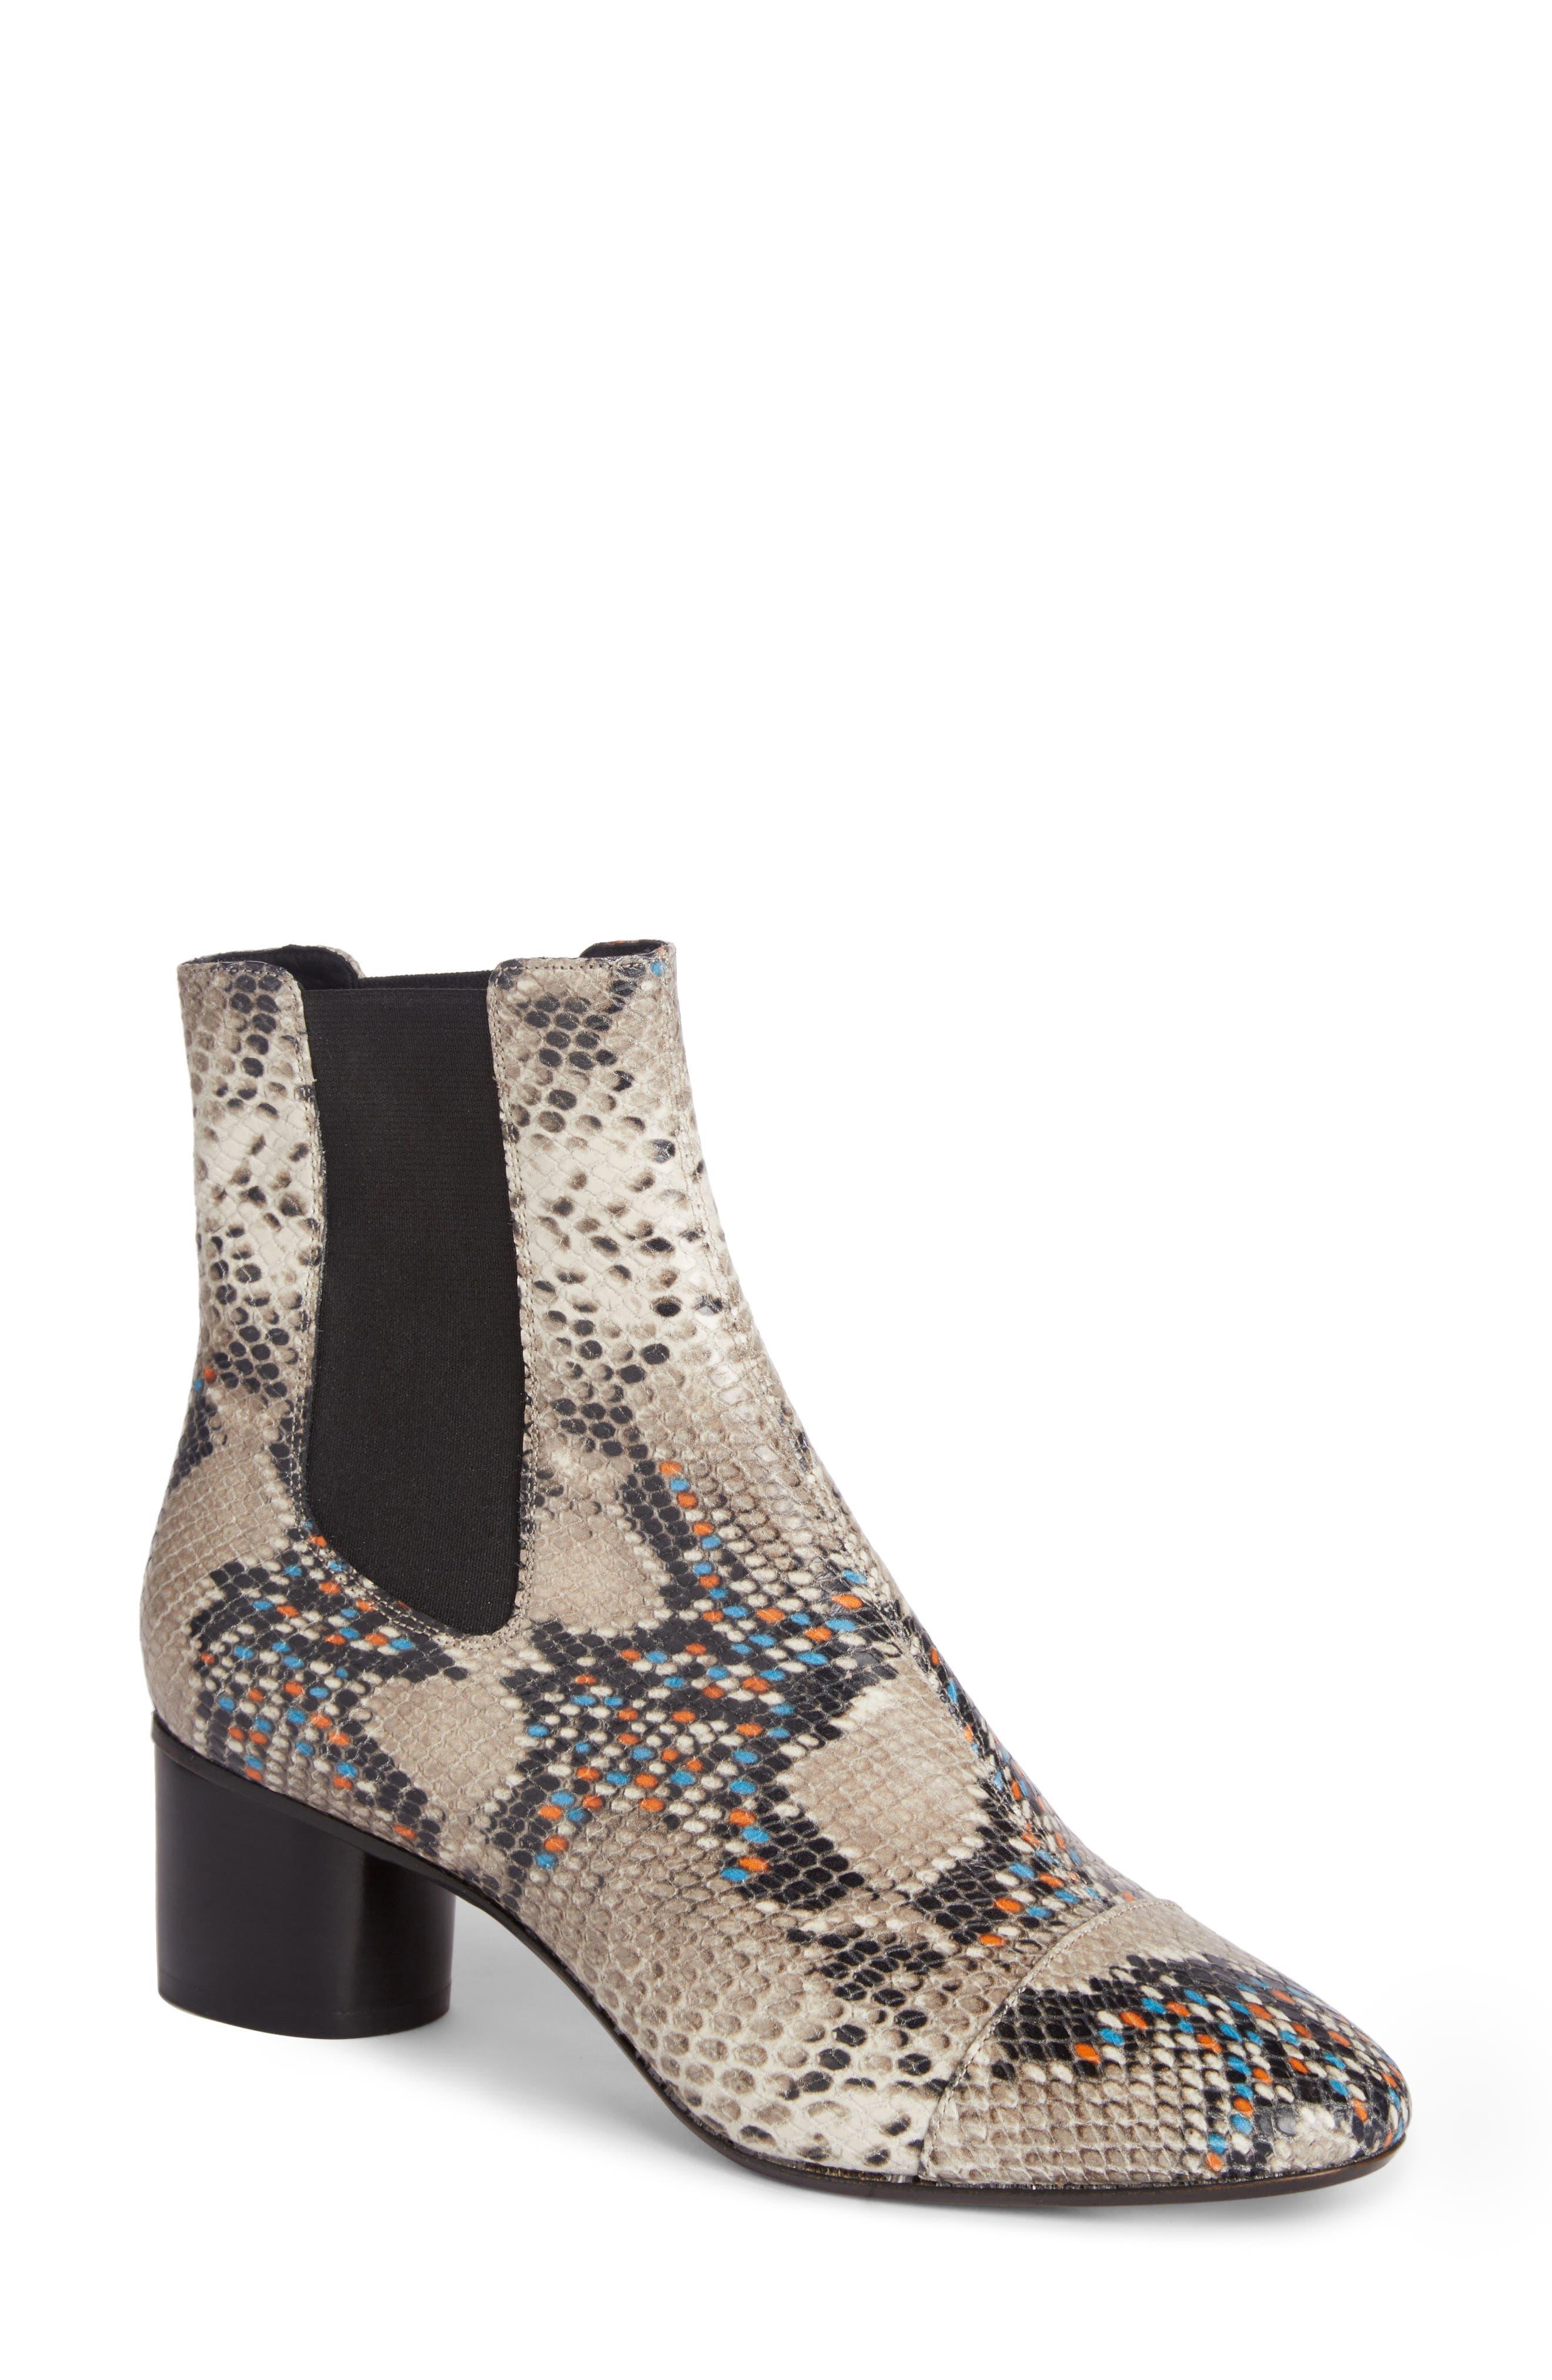 Danelya Snakeskin Embossed Chelsea Boot,                         Main,                         color, Grey